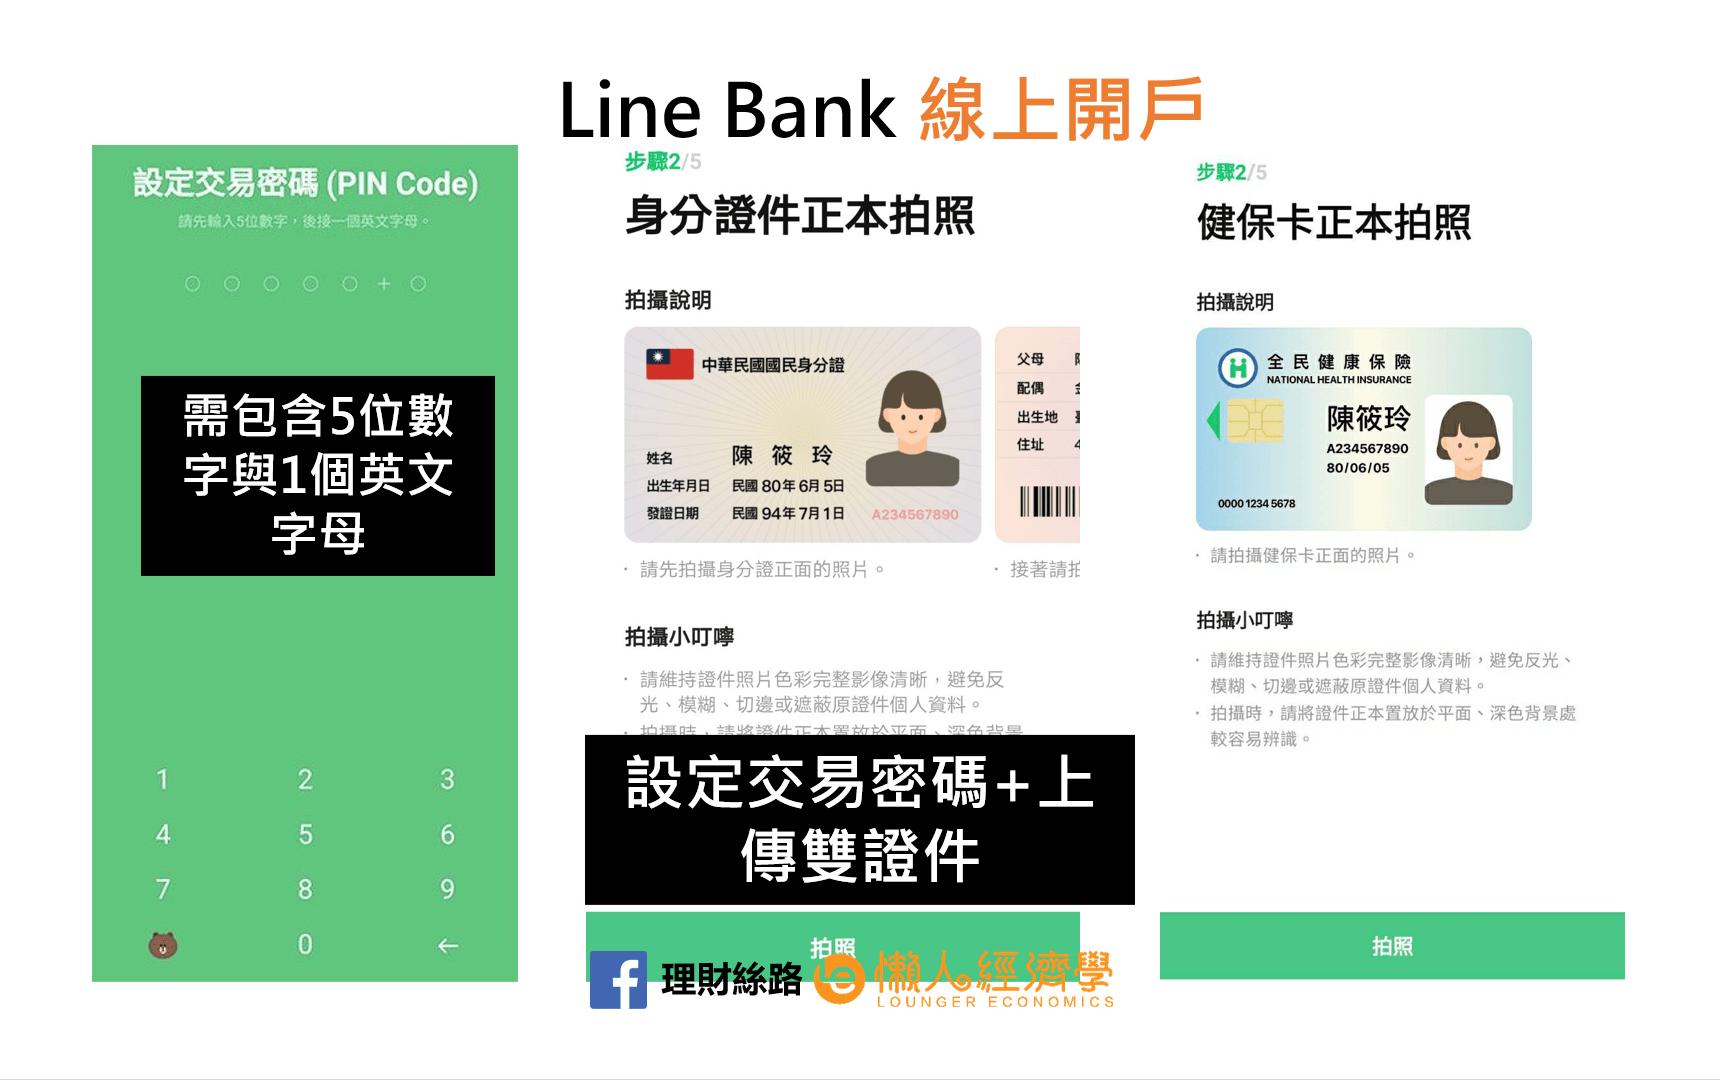 Line Bank設定交易密碼